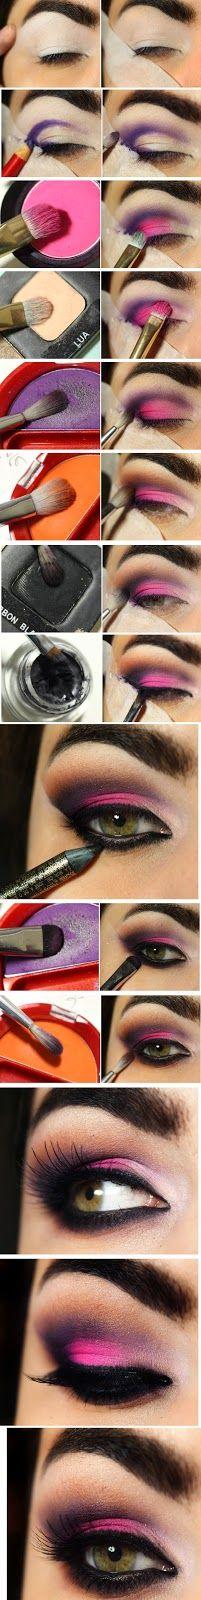 Pink and purple smoky eye